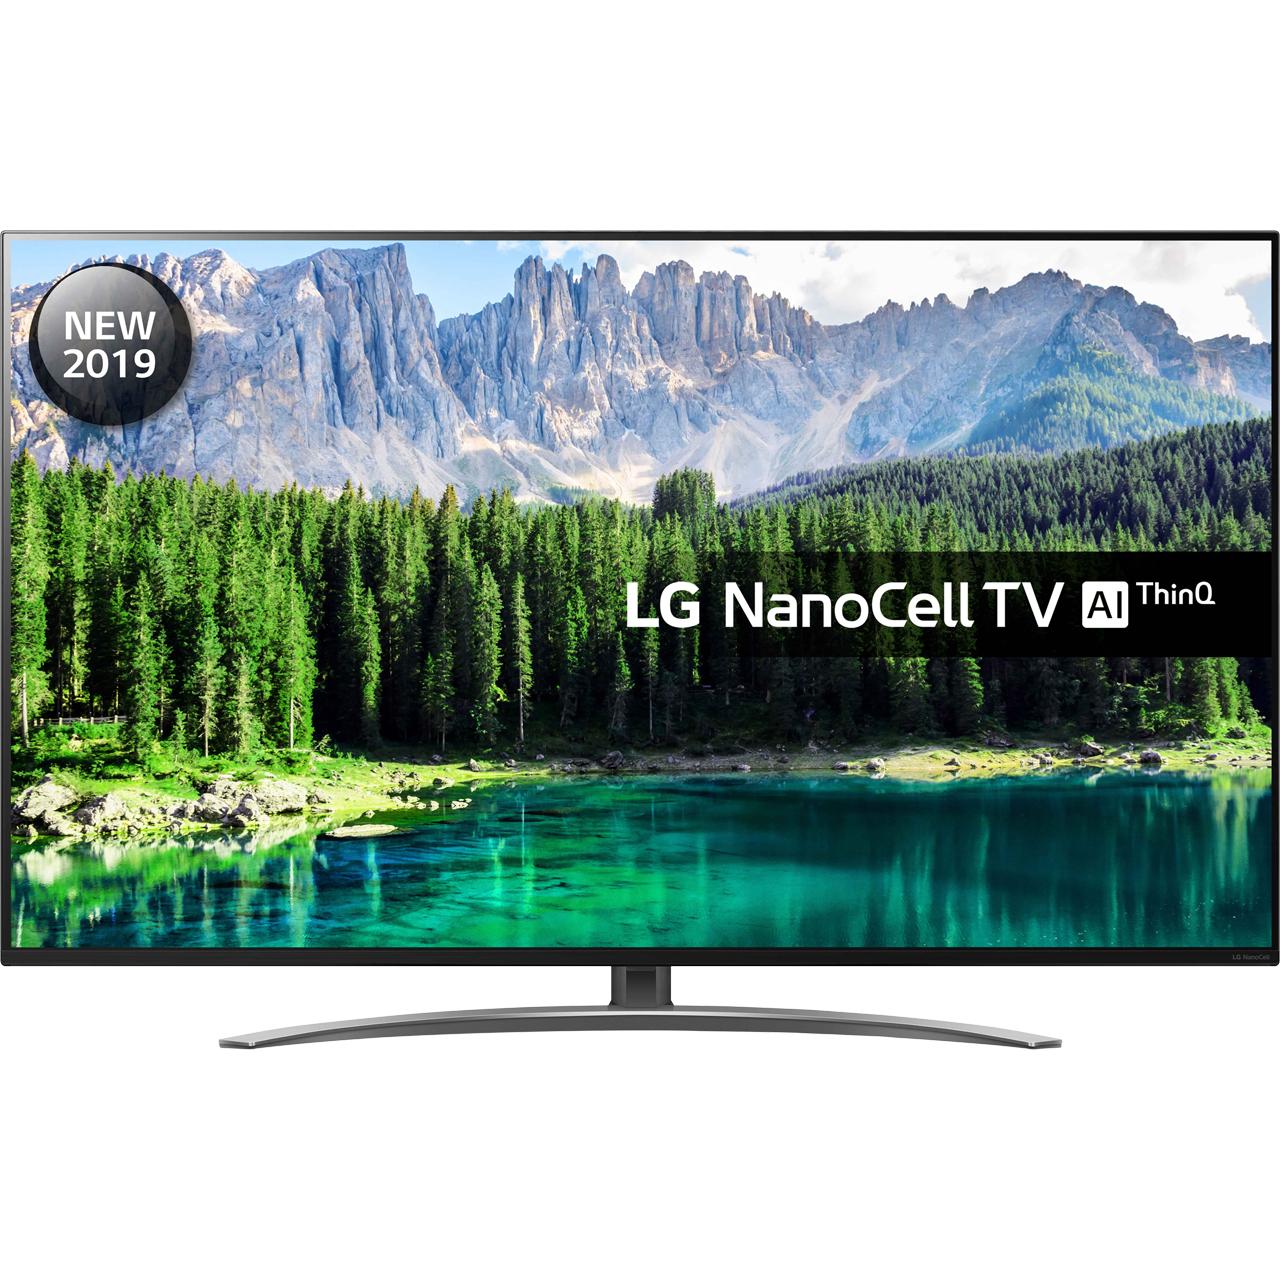 "LG 55SM8600PLA 55"" Smart 4K Ultra HD TV with Nano Cell £656.10 @ AO"